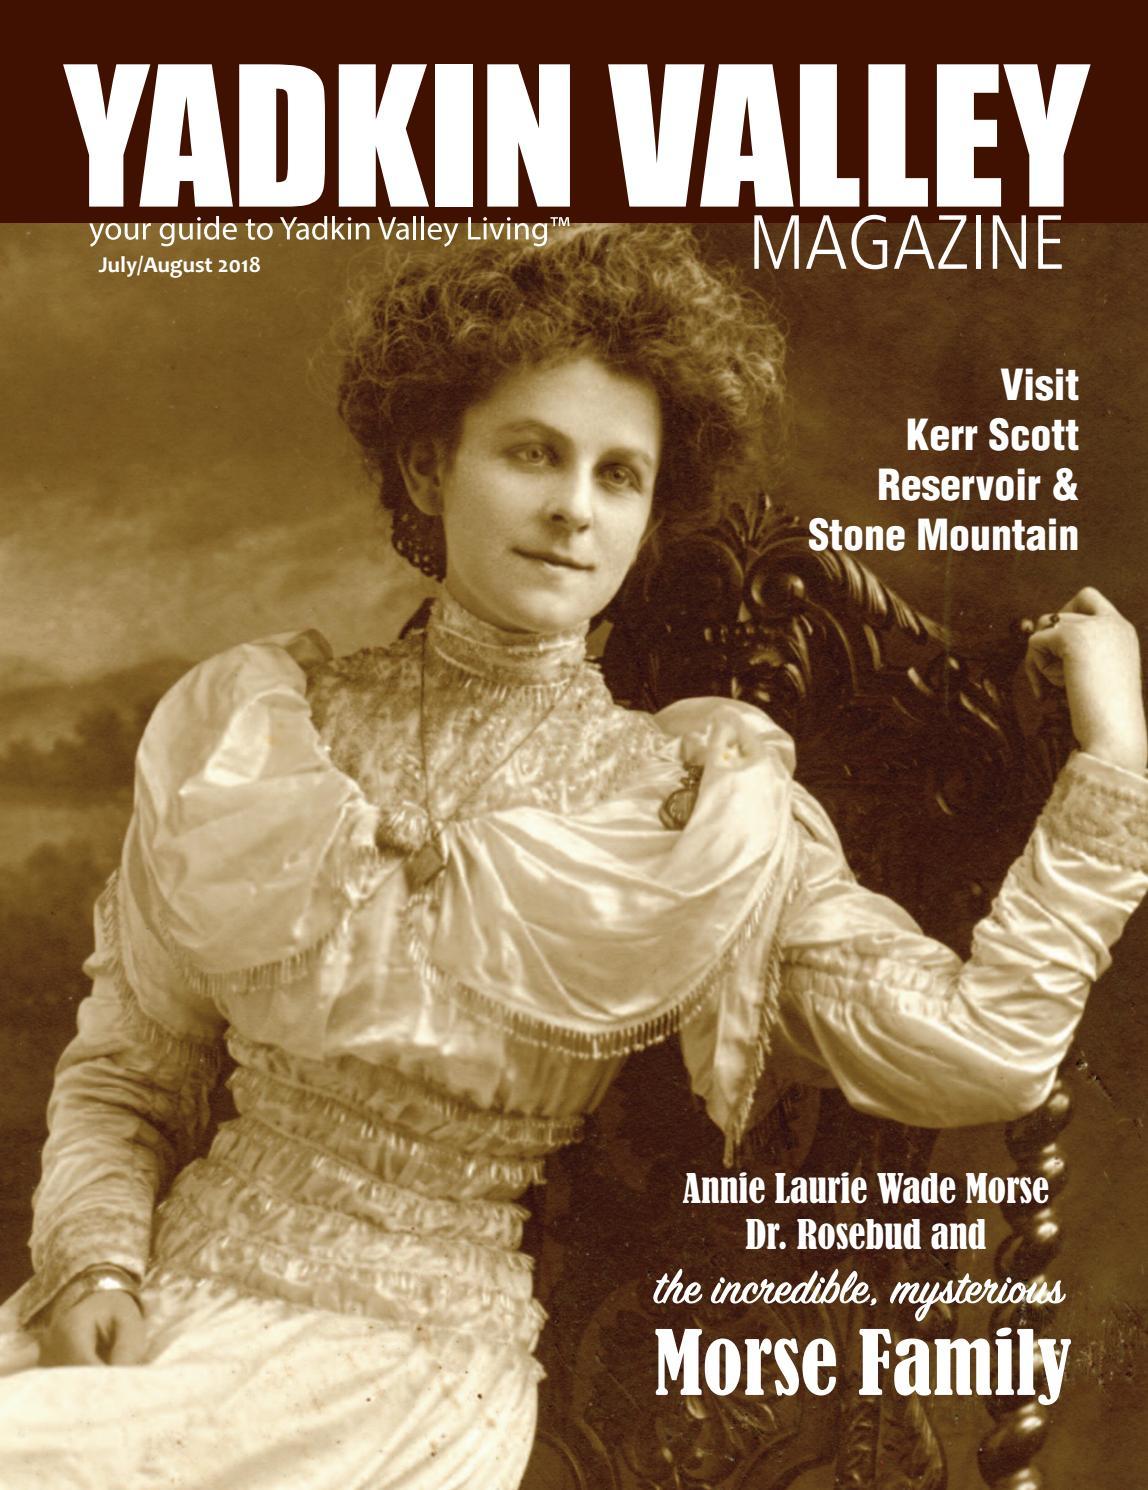 Yadkin Valley Magazine July August 2018 By Reel Pioneer Koverage Kv 6000 Issuu